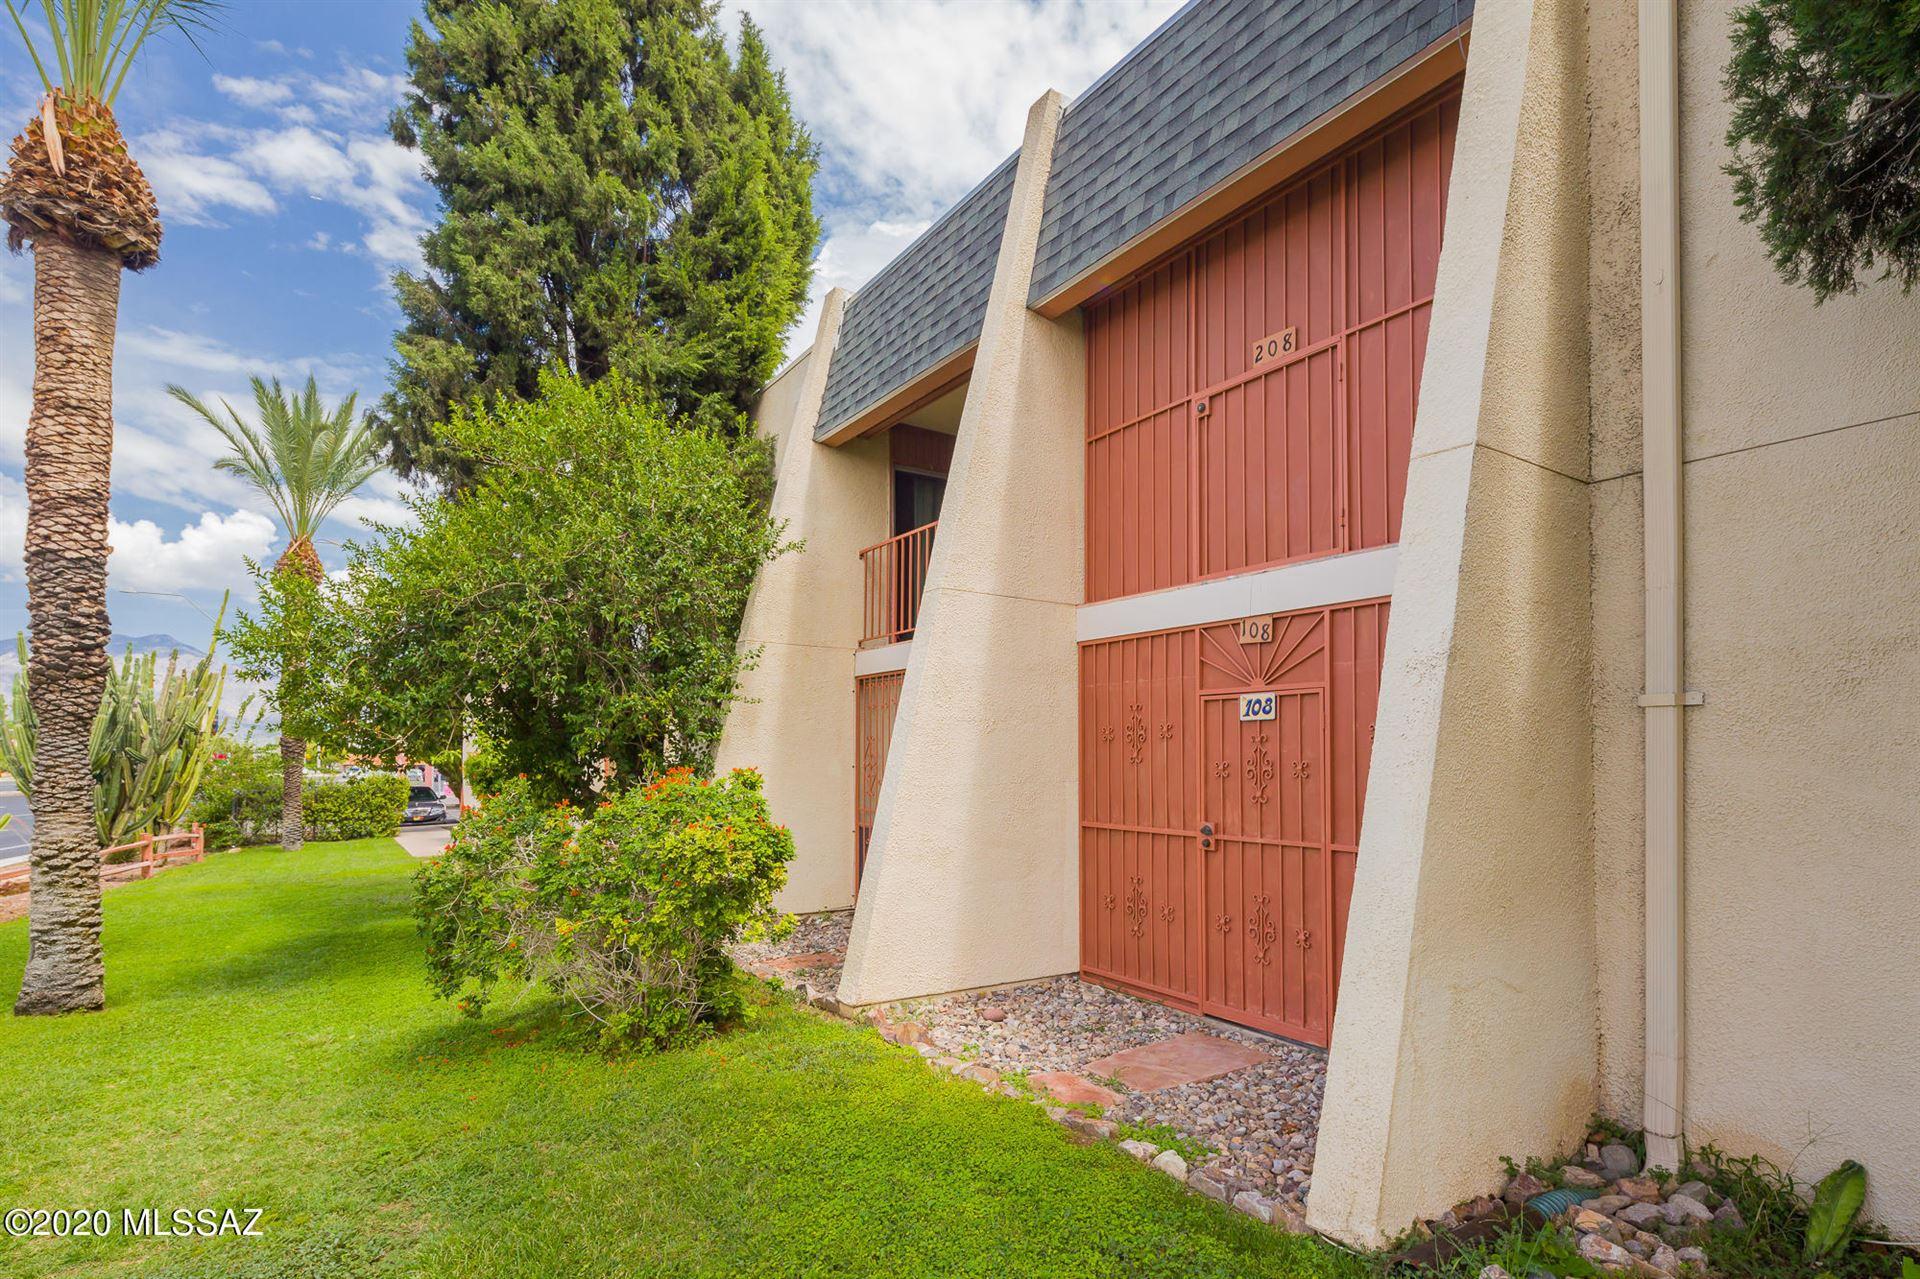 1600 N Wilmot Road #108, Tucson, AZ 85712 - #: 22031593